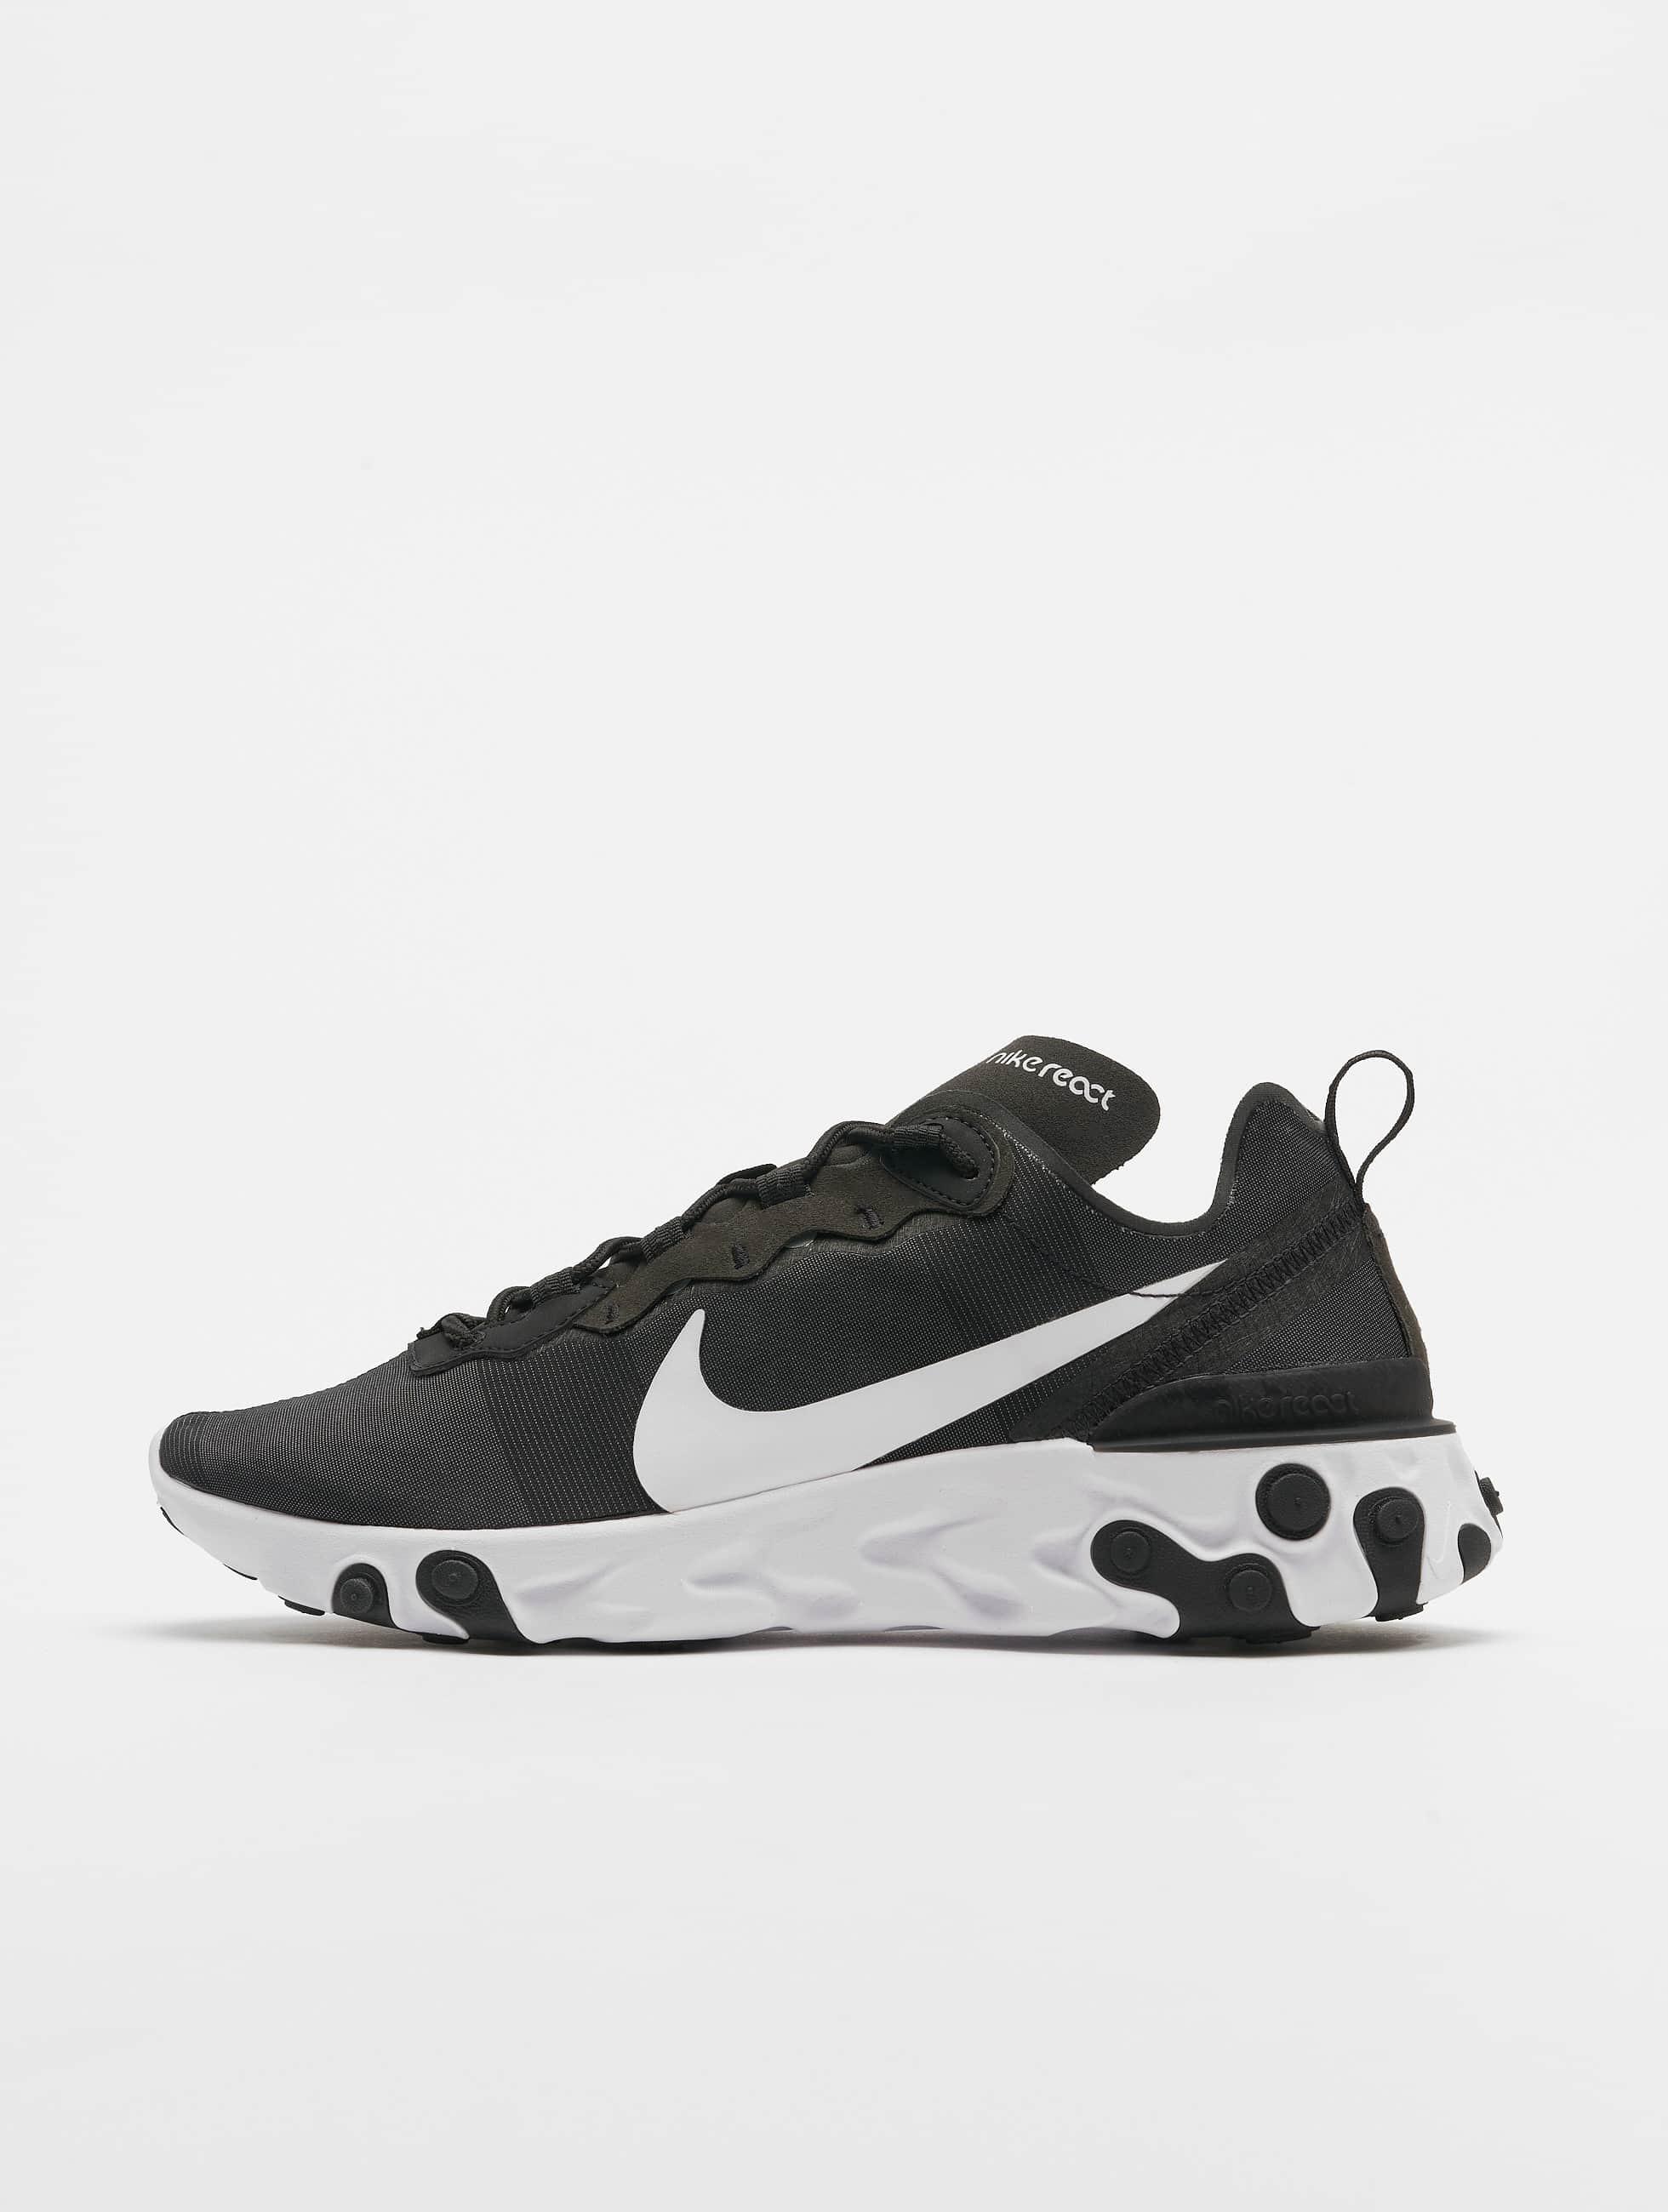 Nike Shox R4 Sneakers WhiteMetallic SilvernMetallic Silvern